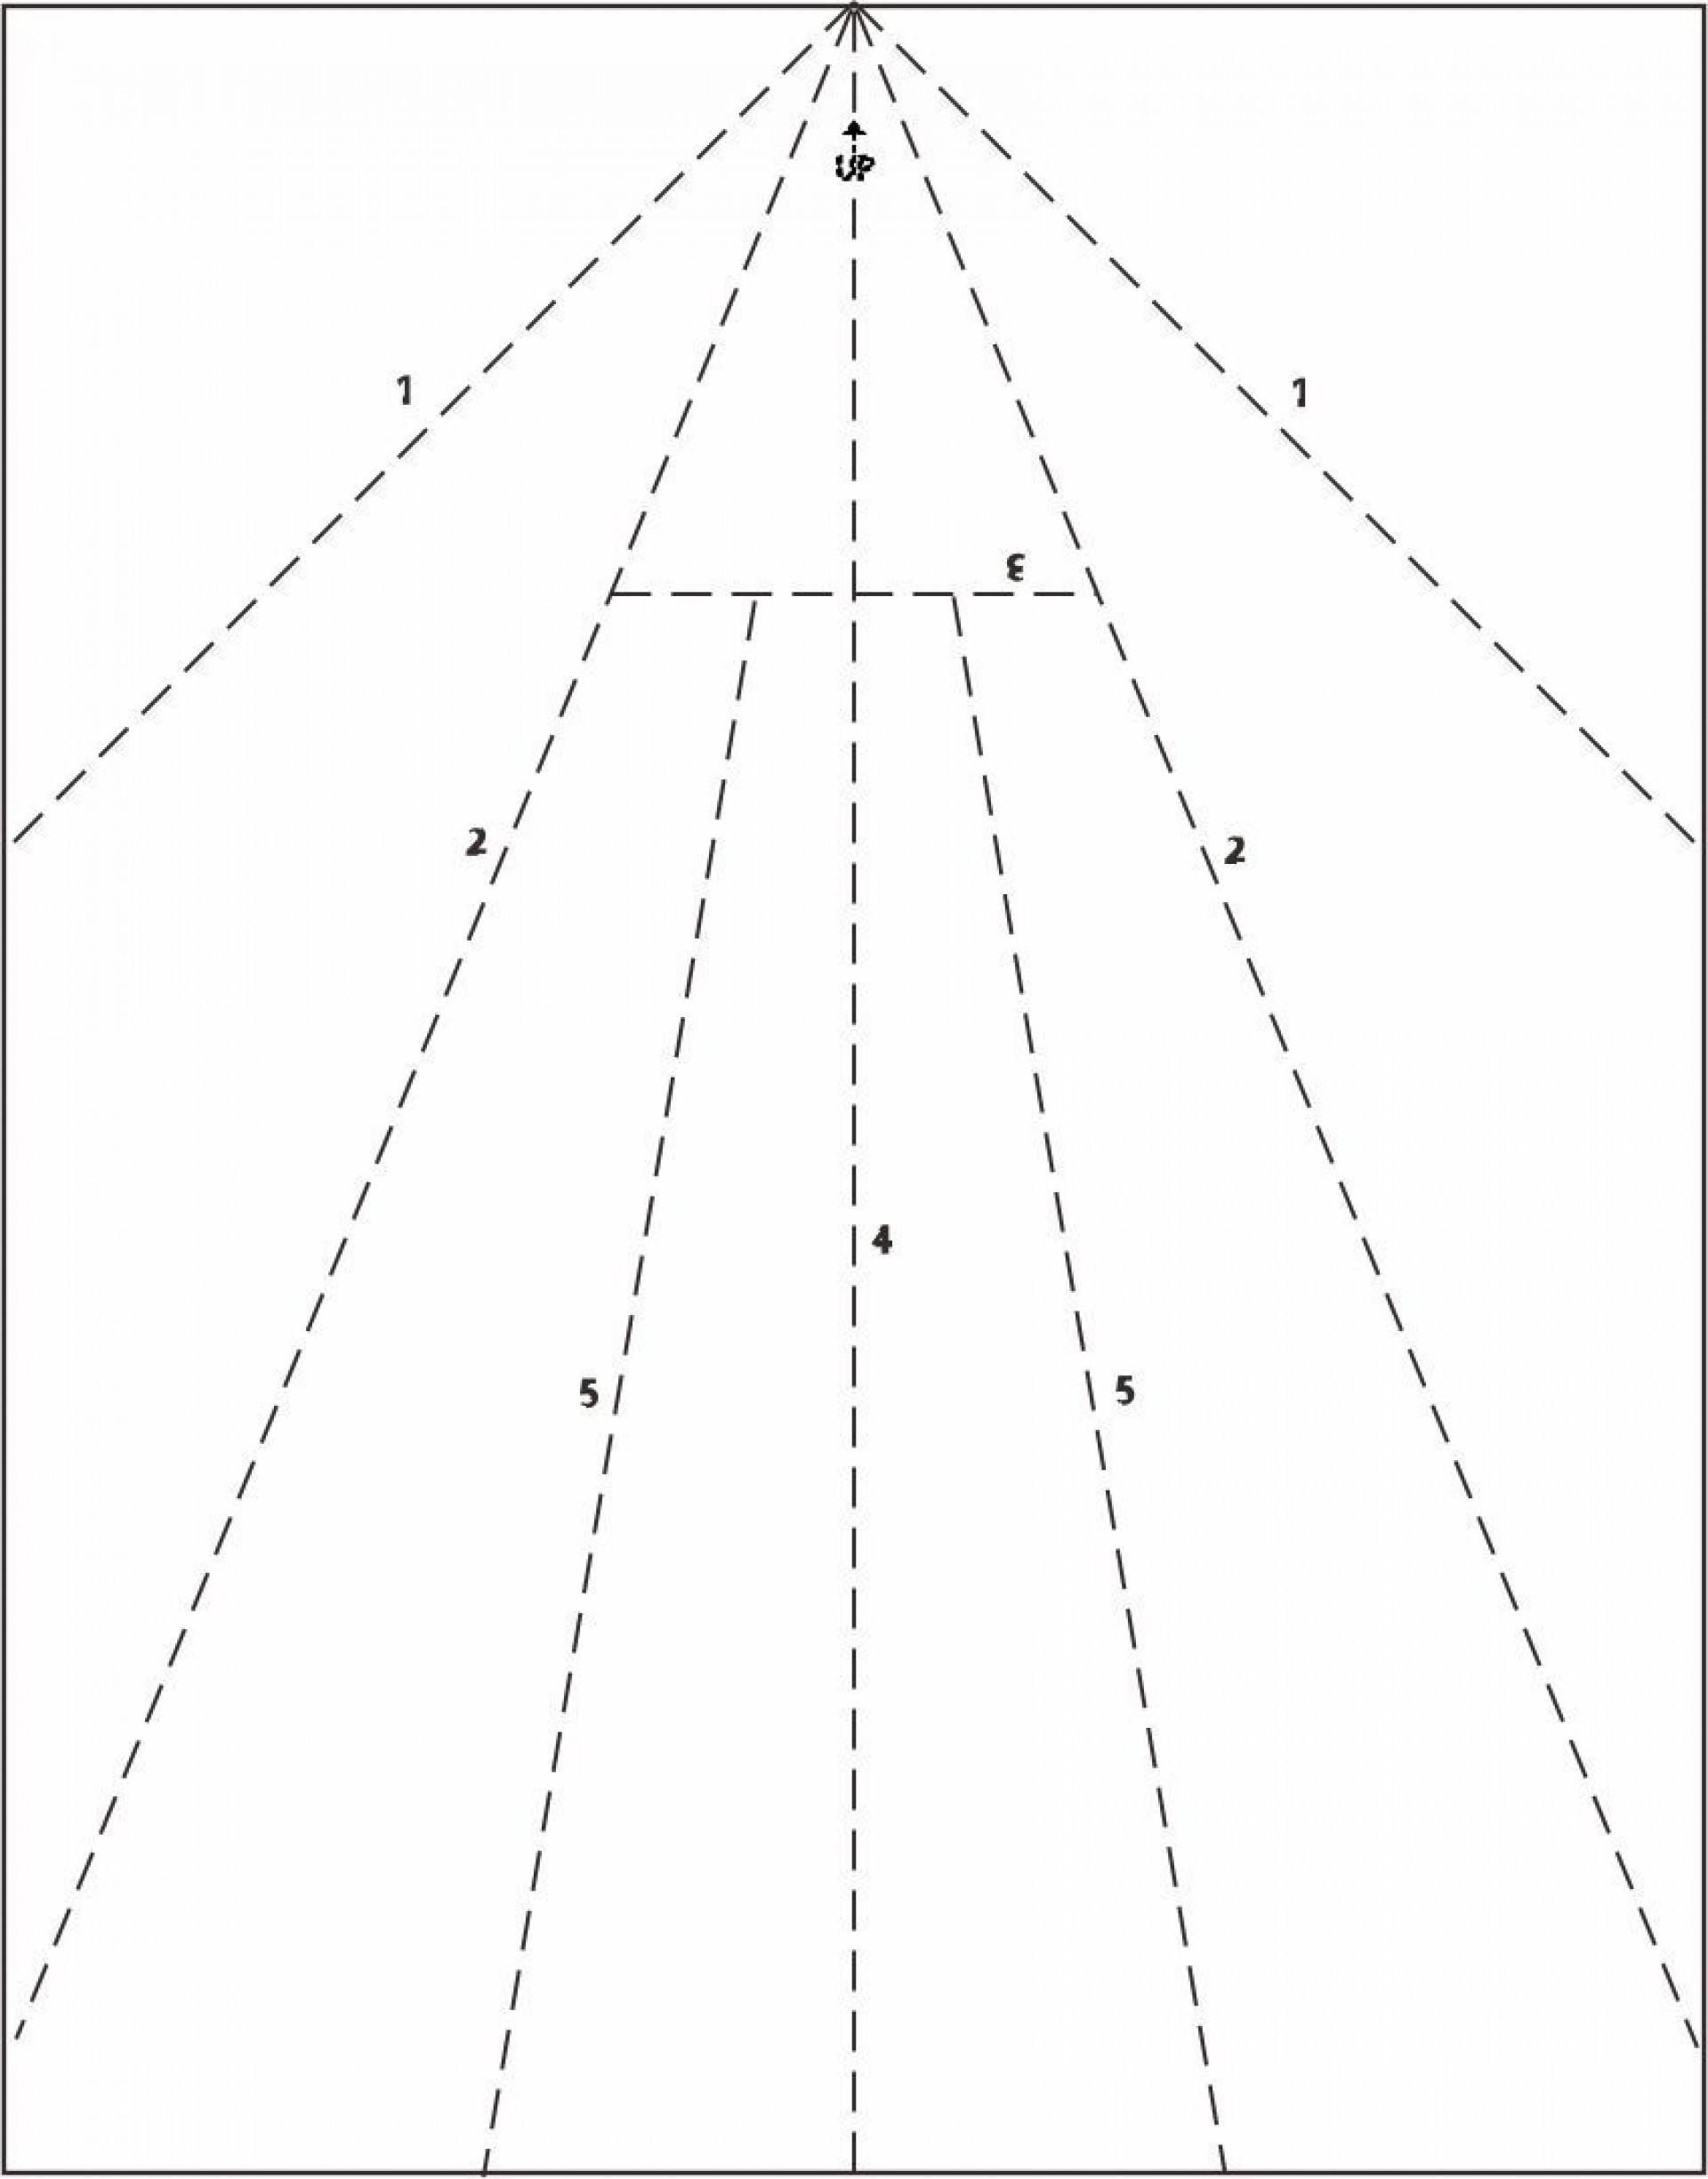 009 Surprising Printable Paper Airplane Pattern Example  Free Plane Design Designs-printable Template1920